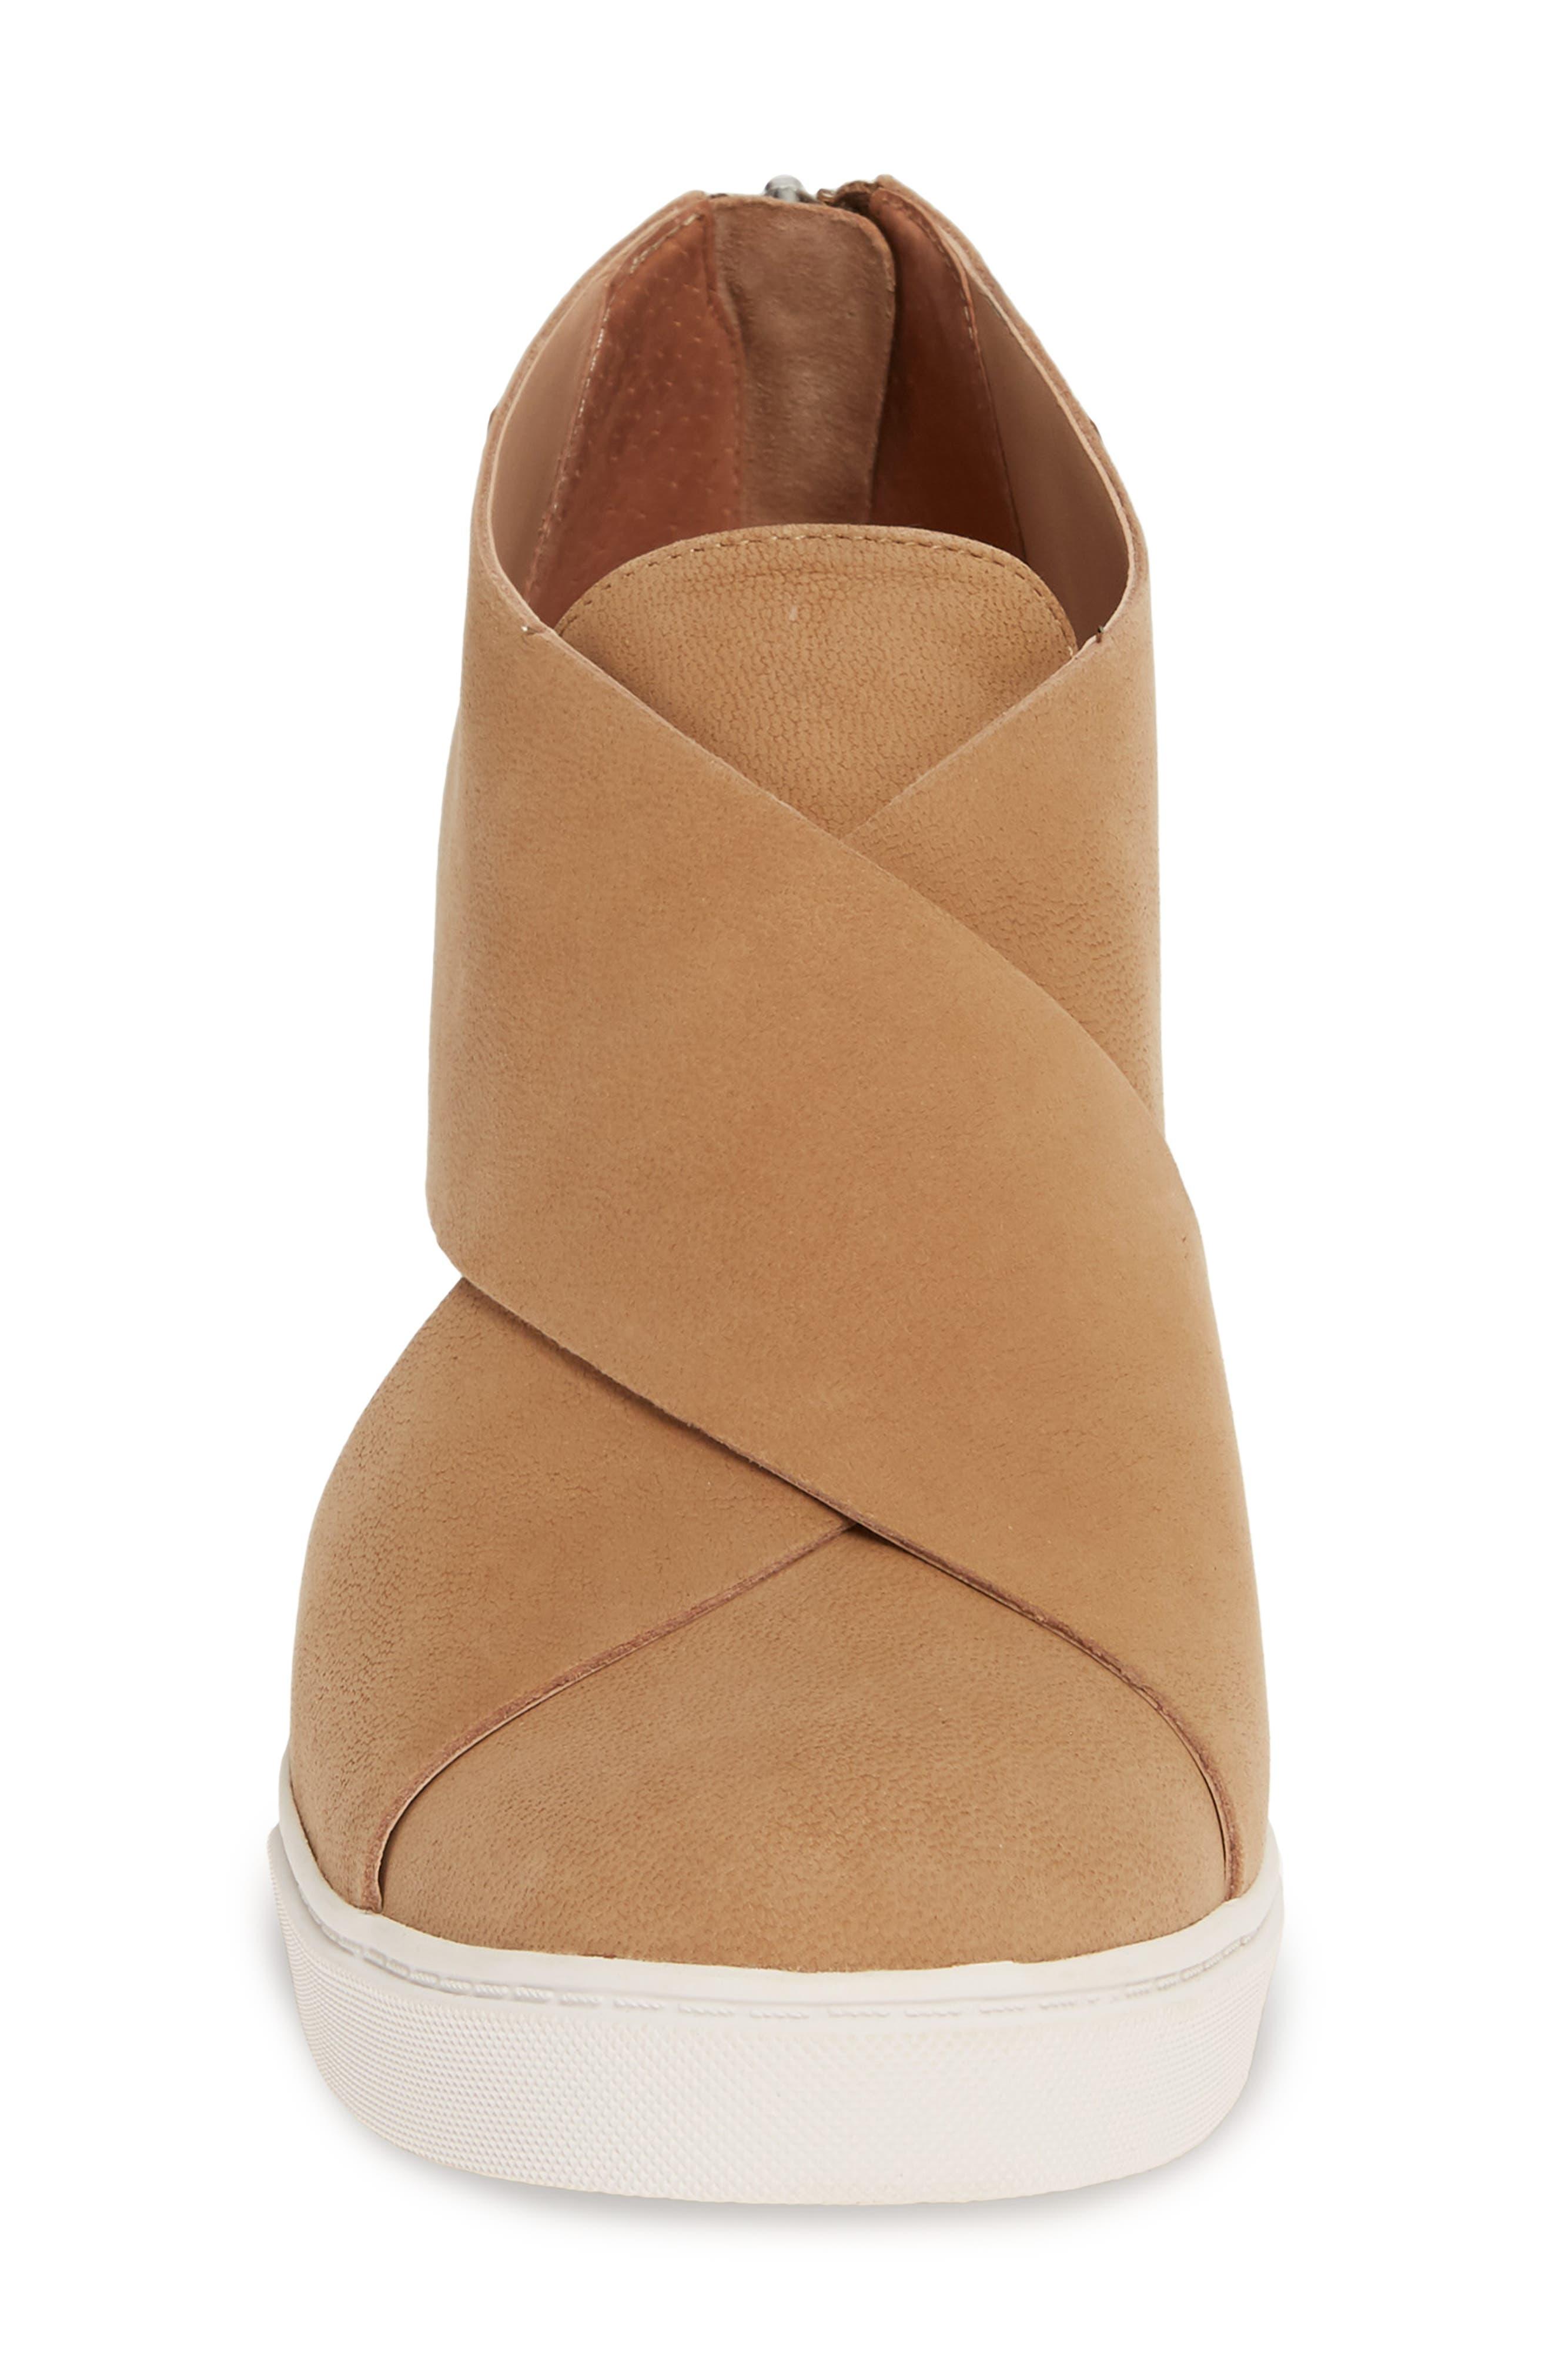 Linea Paolo | Faith Wedge Sneaker